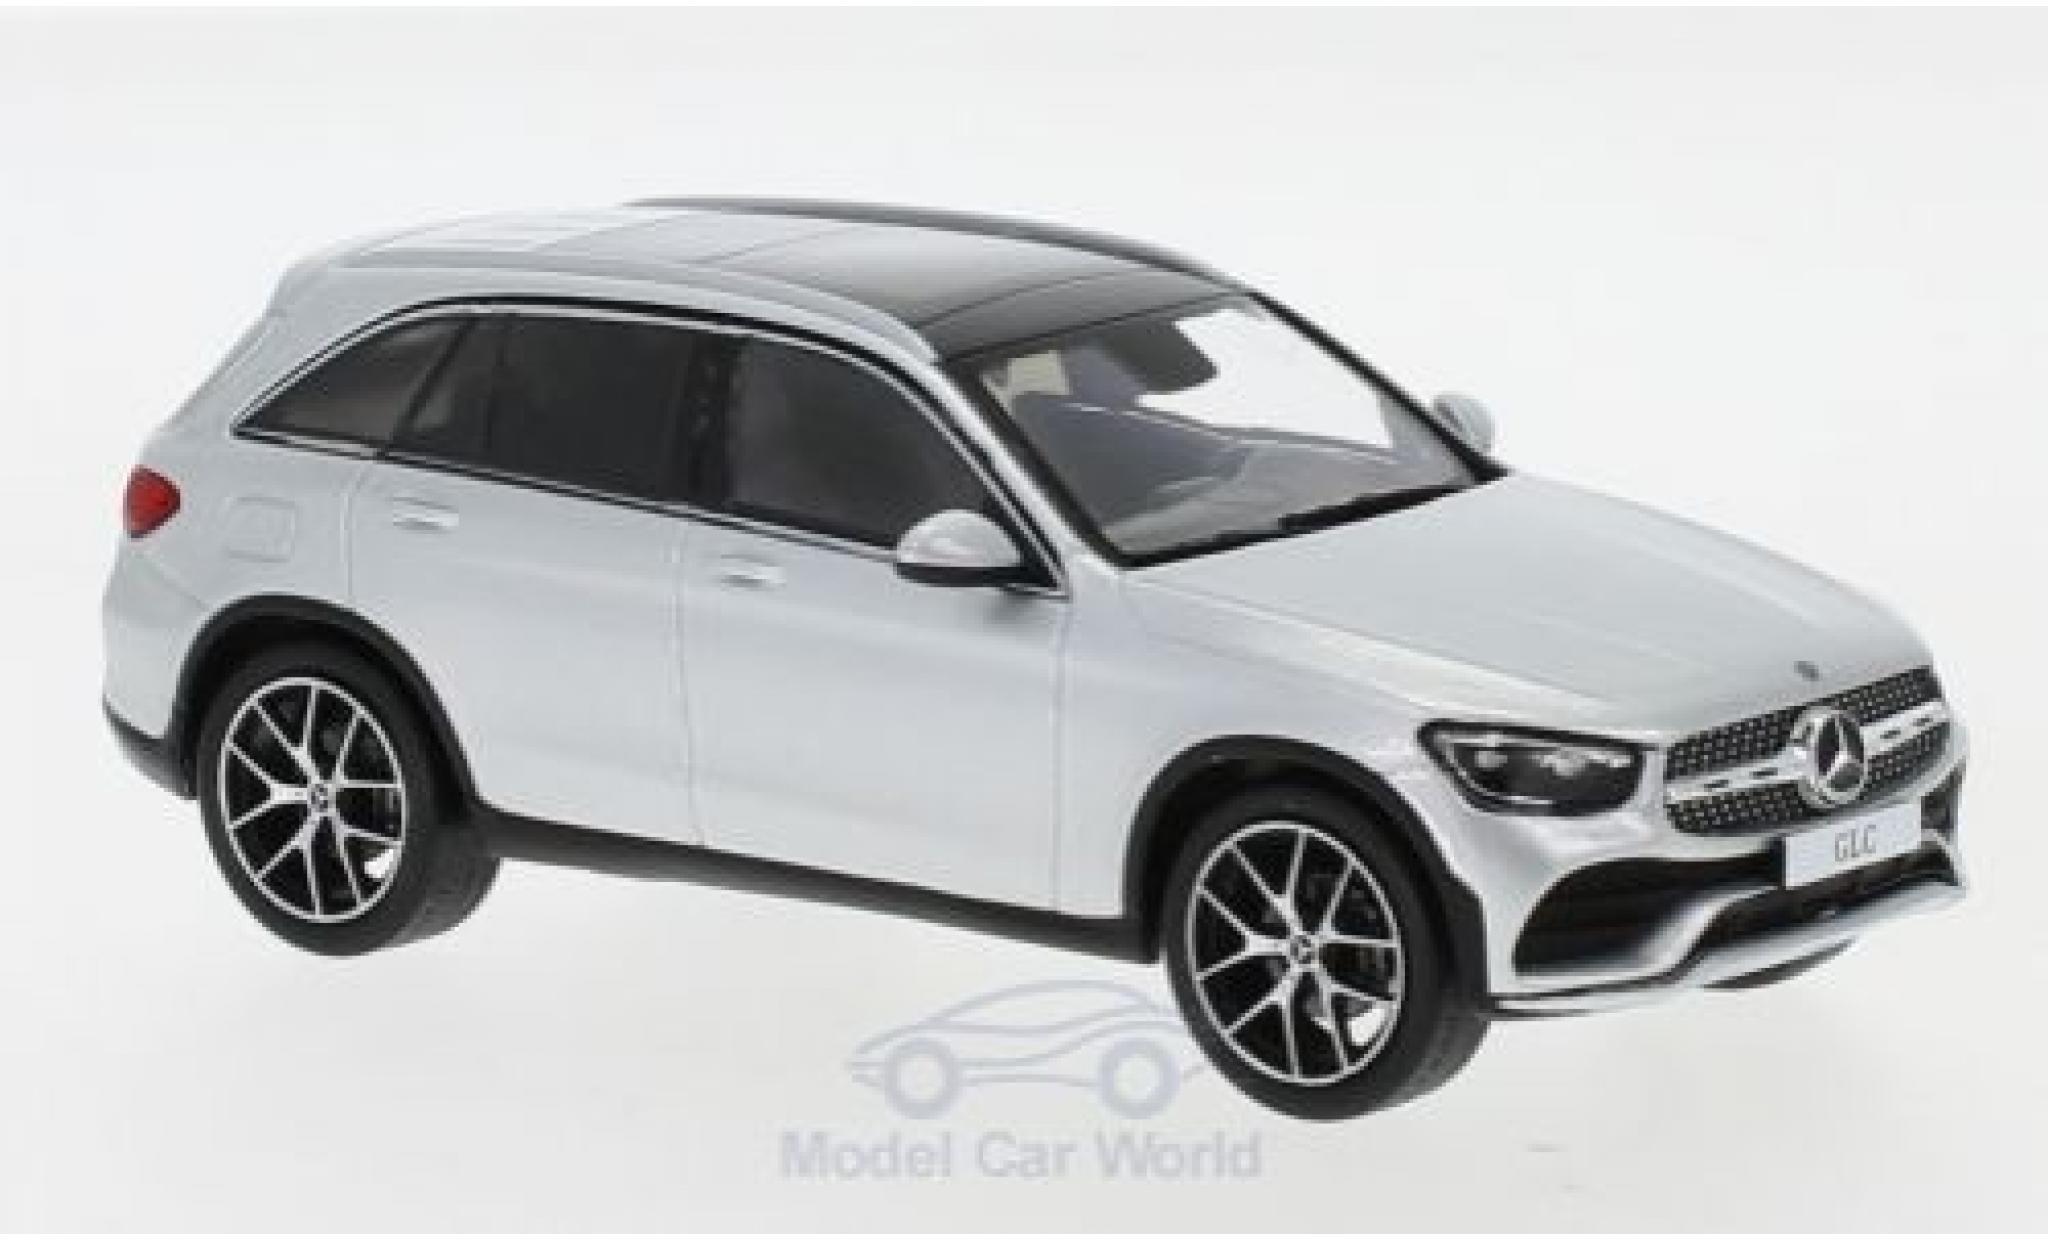 Mercedes Classe GLC 1/43 Spark GLC (X253) Mopf grise 2019